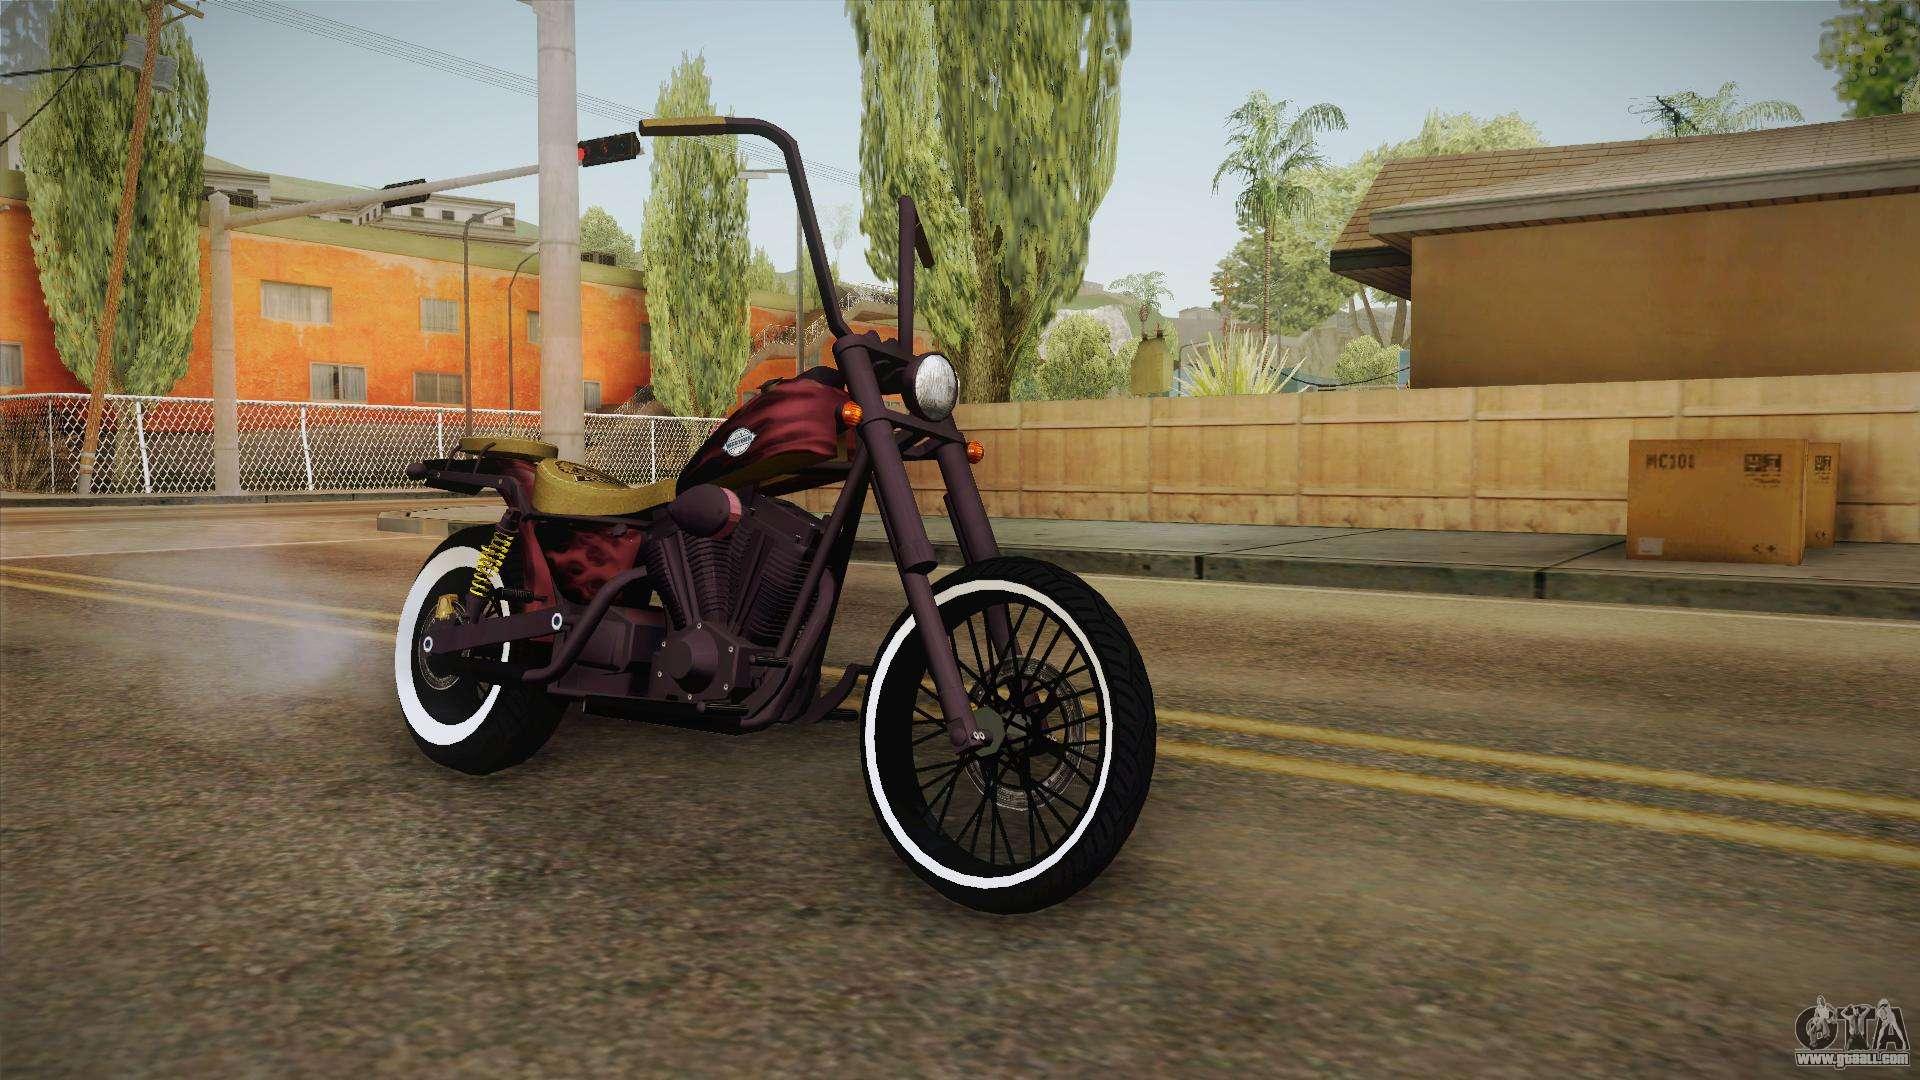 GTA 5 Western Daemon for GTA San Andreas Gta V Western Daemon